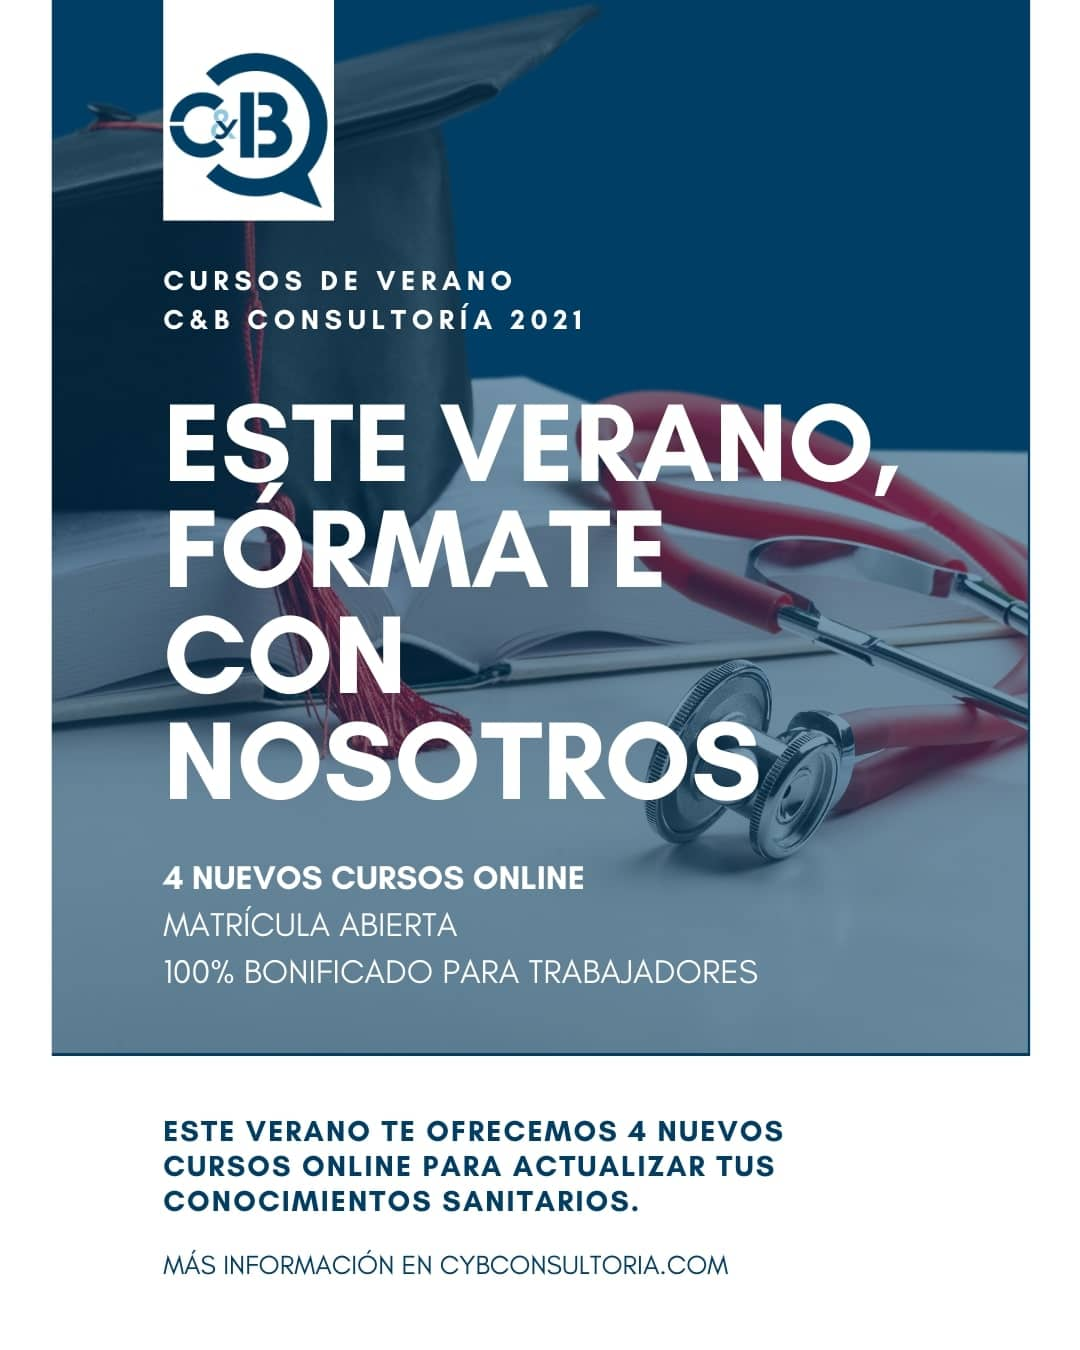 cabecera web mv cyb jul 21 (8)